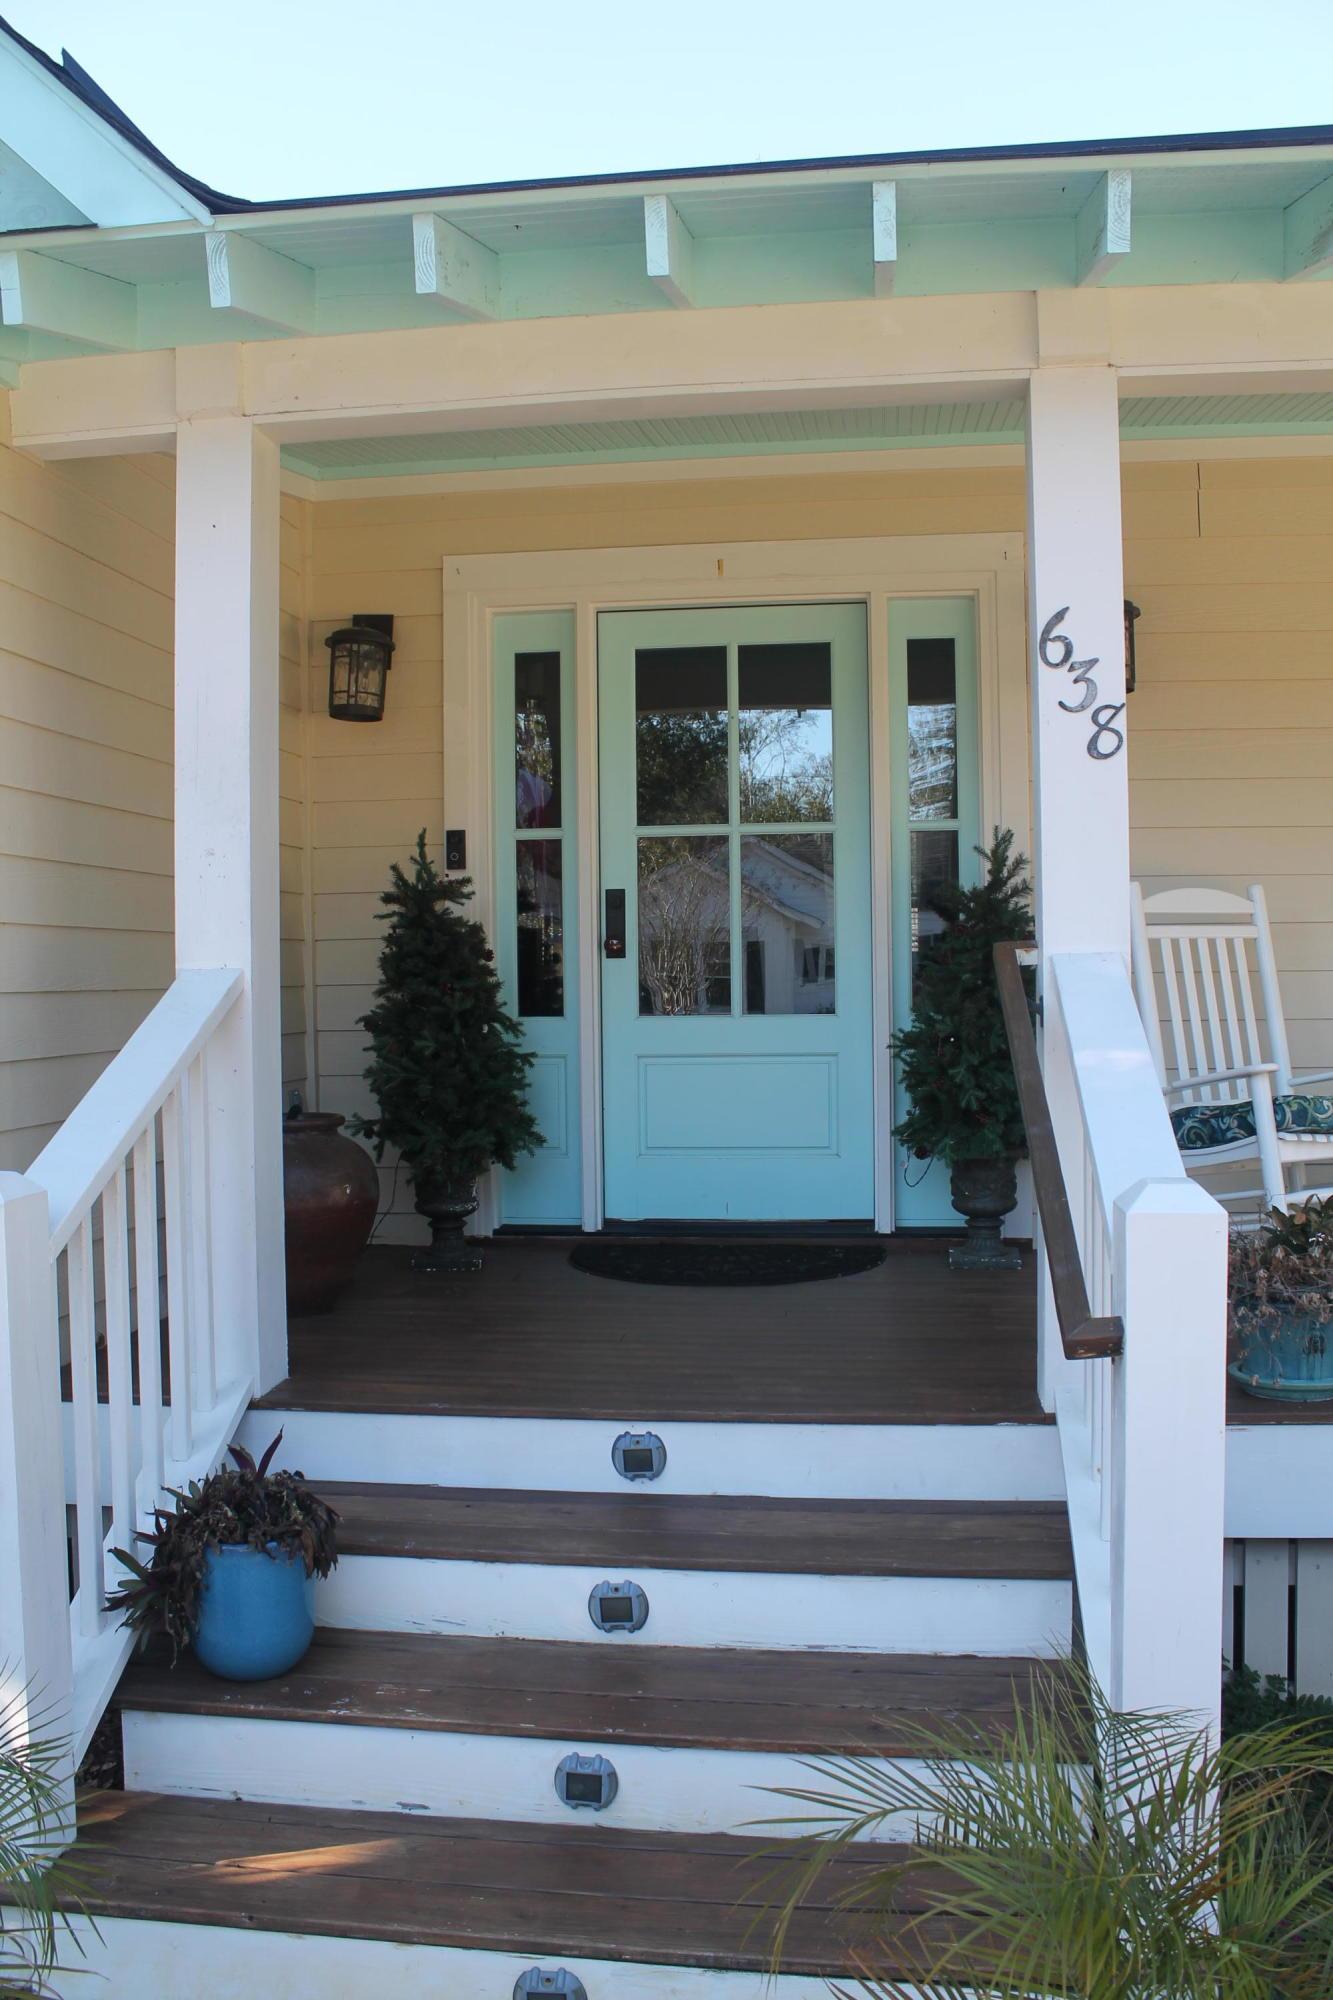 Old Mt Pleasant Homes For Sale - 638 Adluh, Mount Pleasant, SC - 10